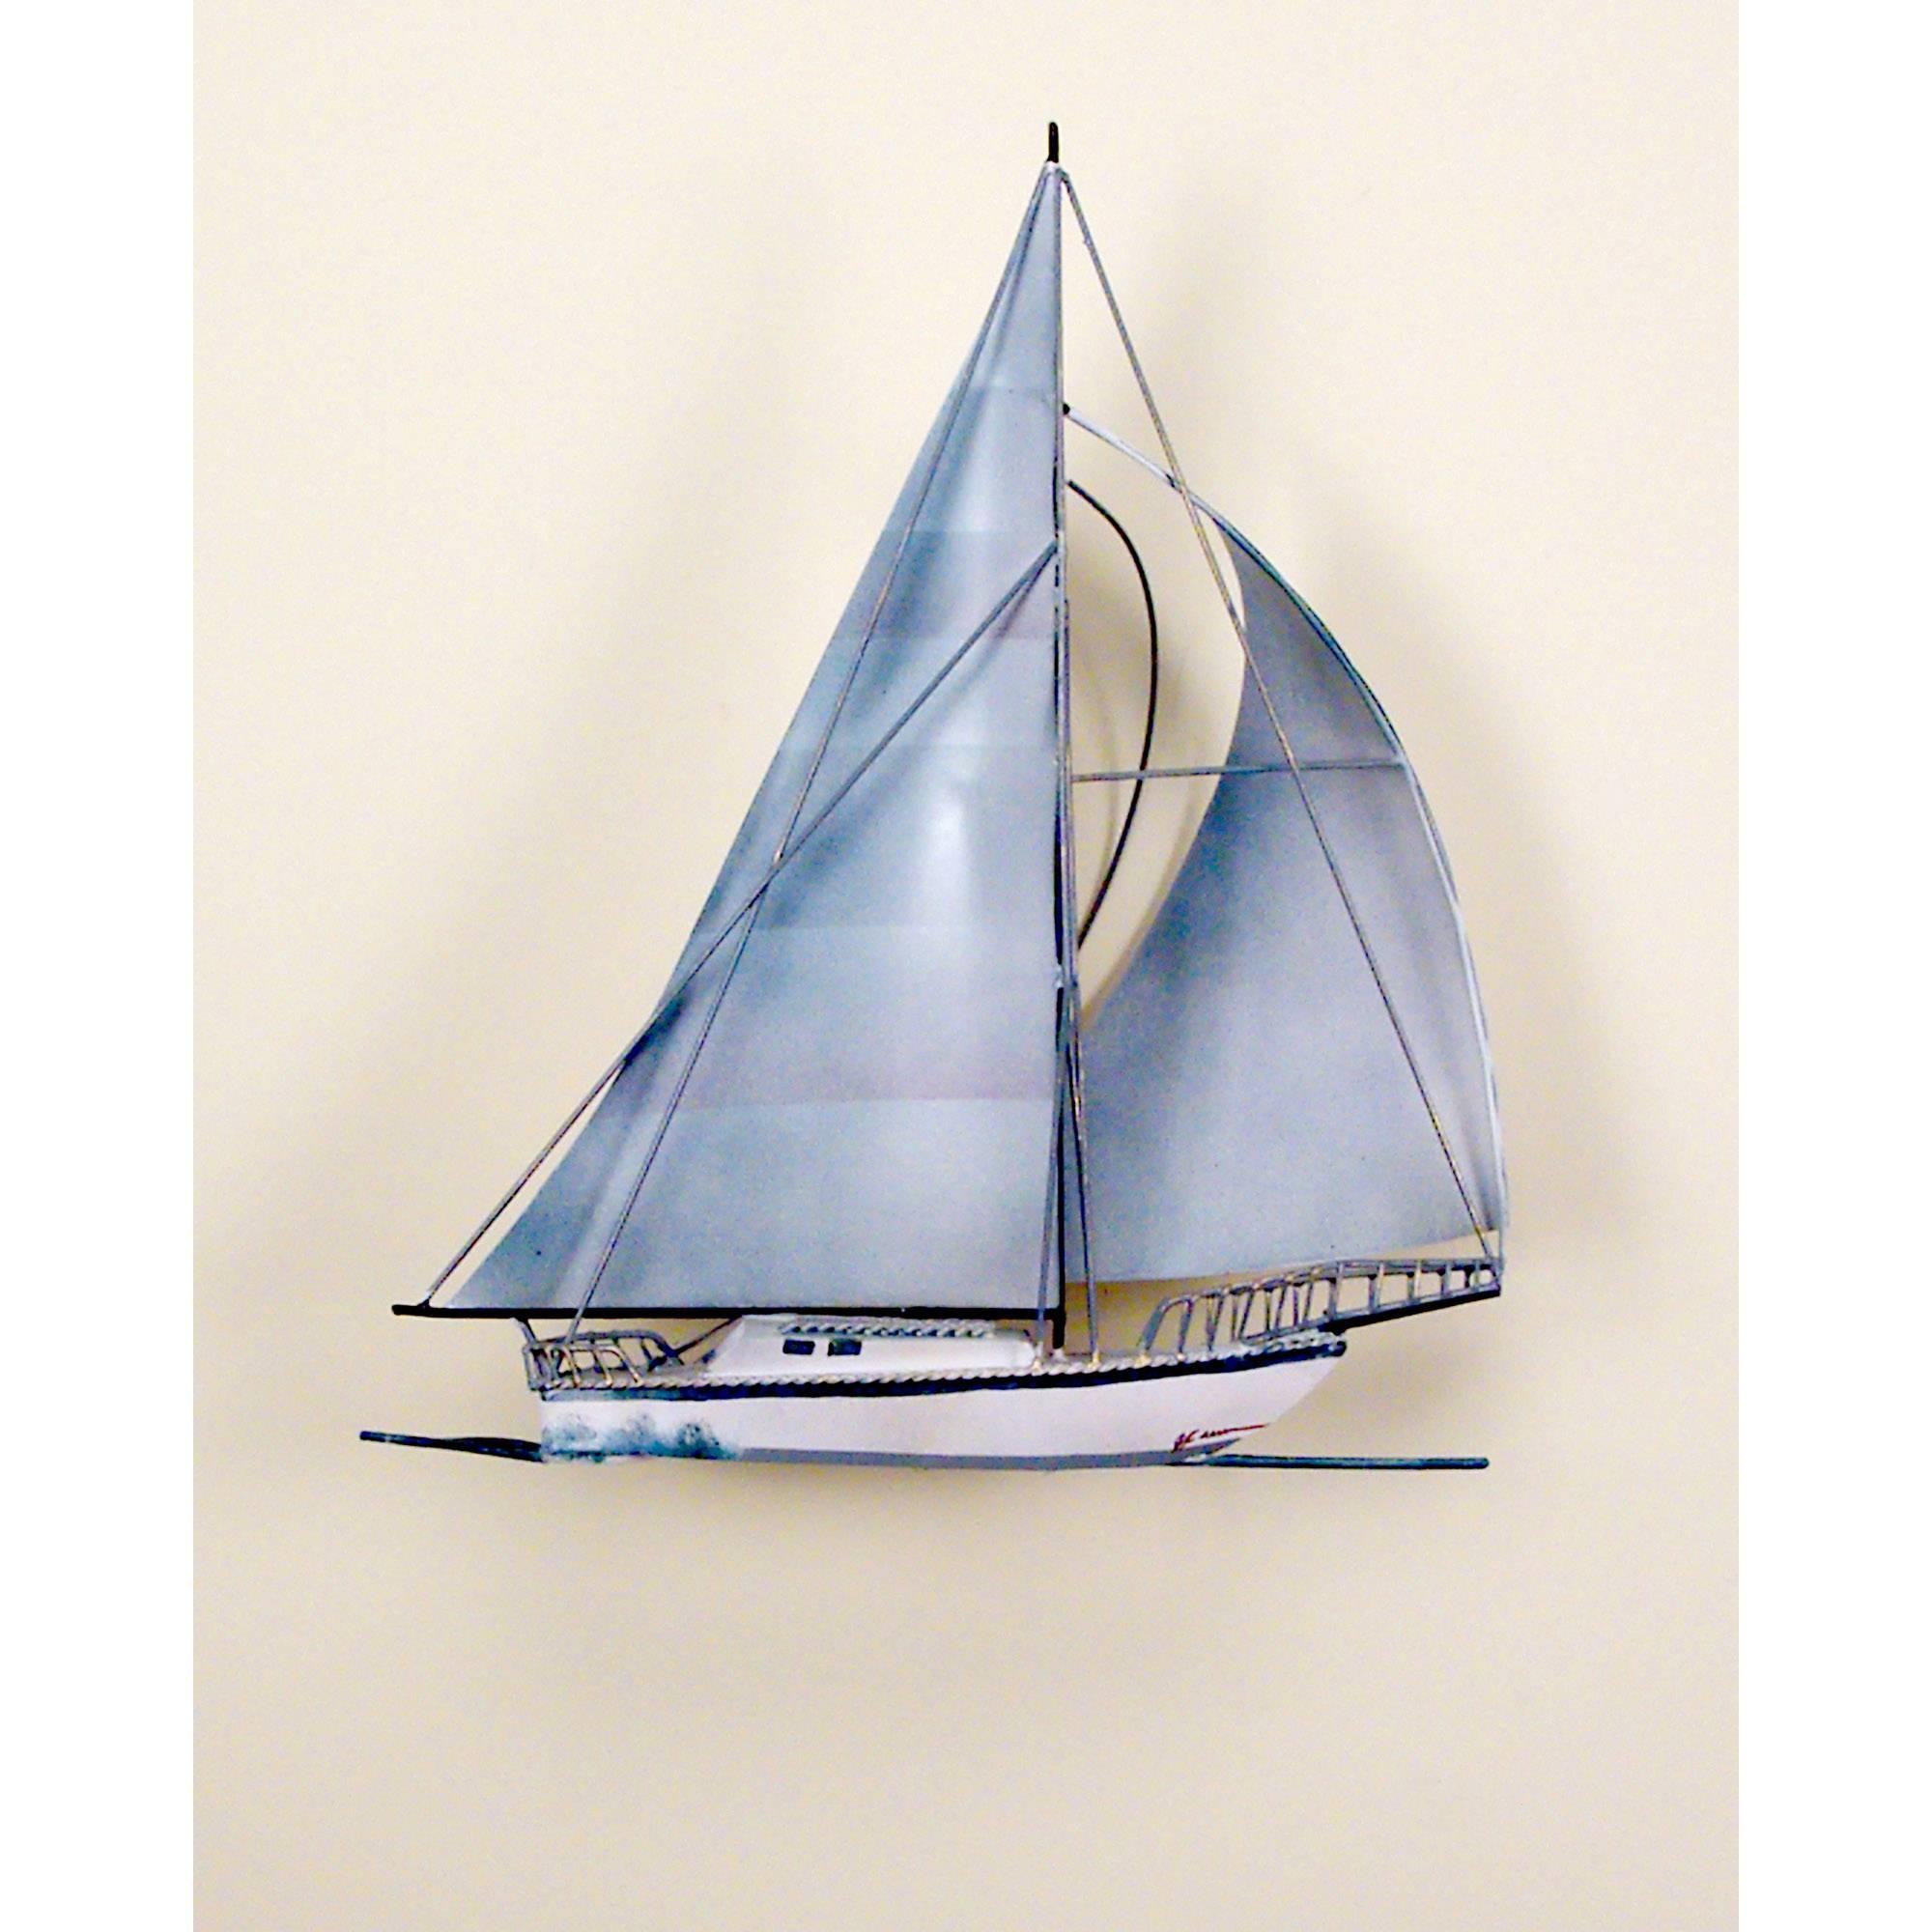 Windjamer Sailboat, Single, Ocean, Boat, Nautical, Sailing In Newest Lighthouse Metal Wall Art (View 20 of 20)